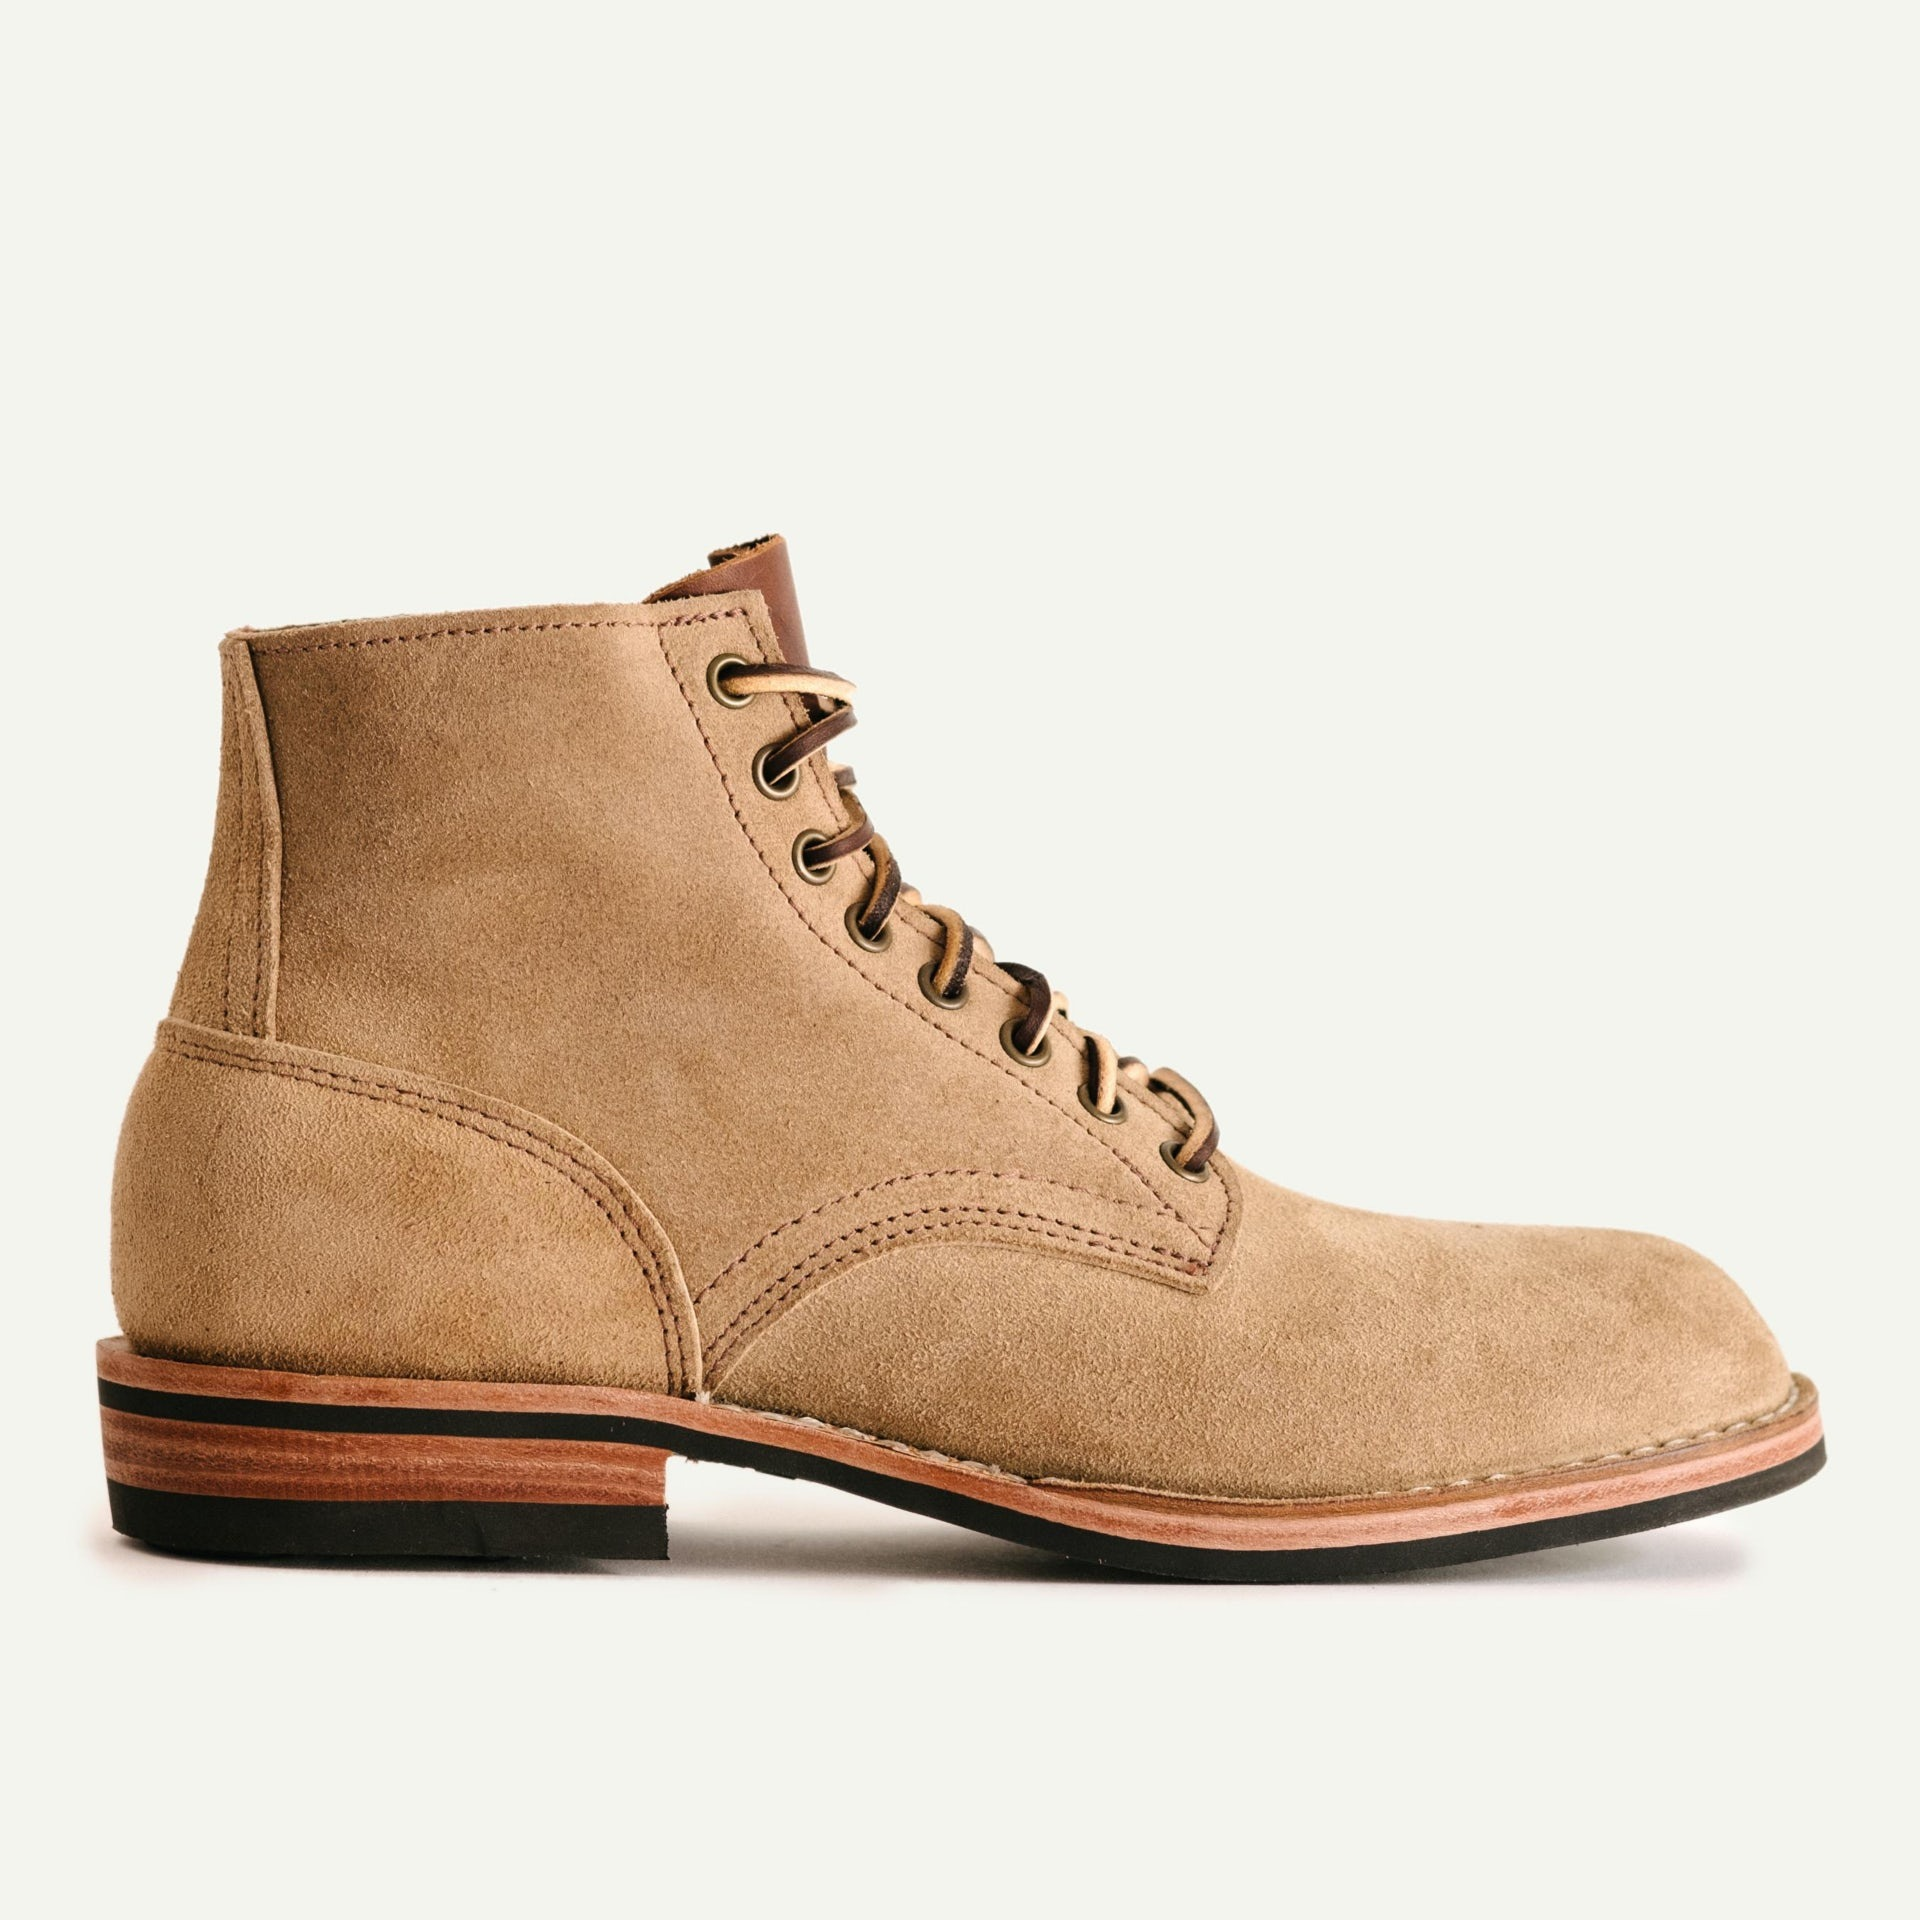 Oak Street Bootmakers beige rough leather storm boot